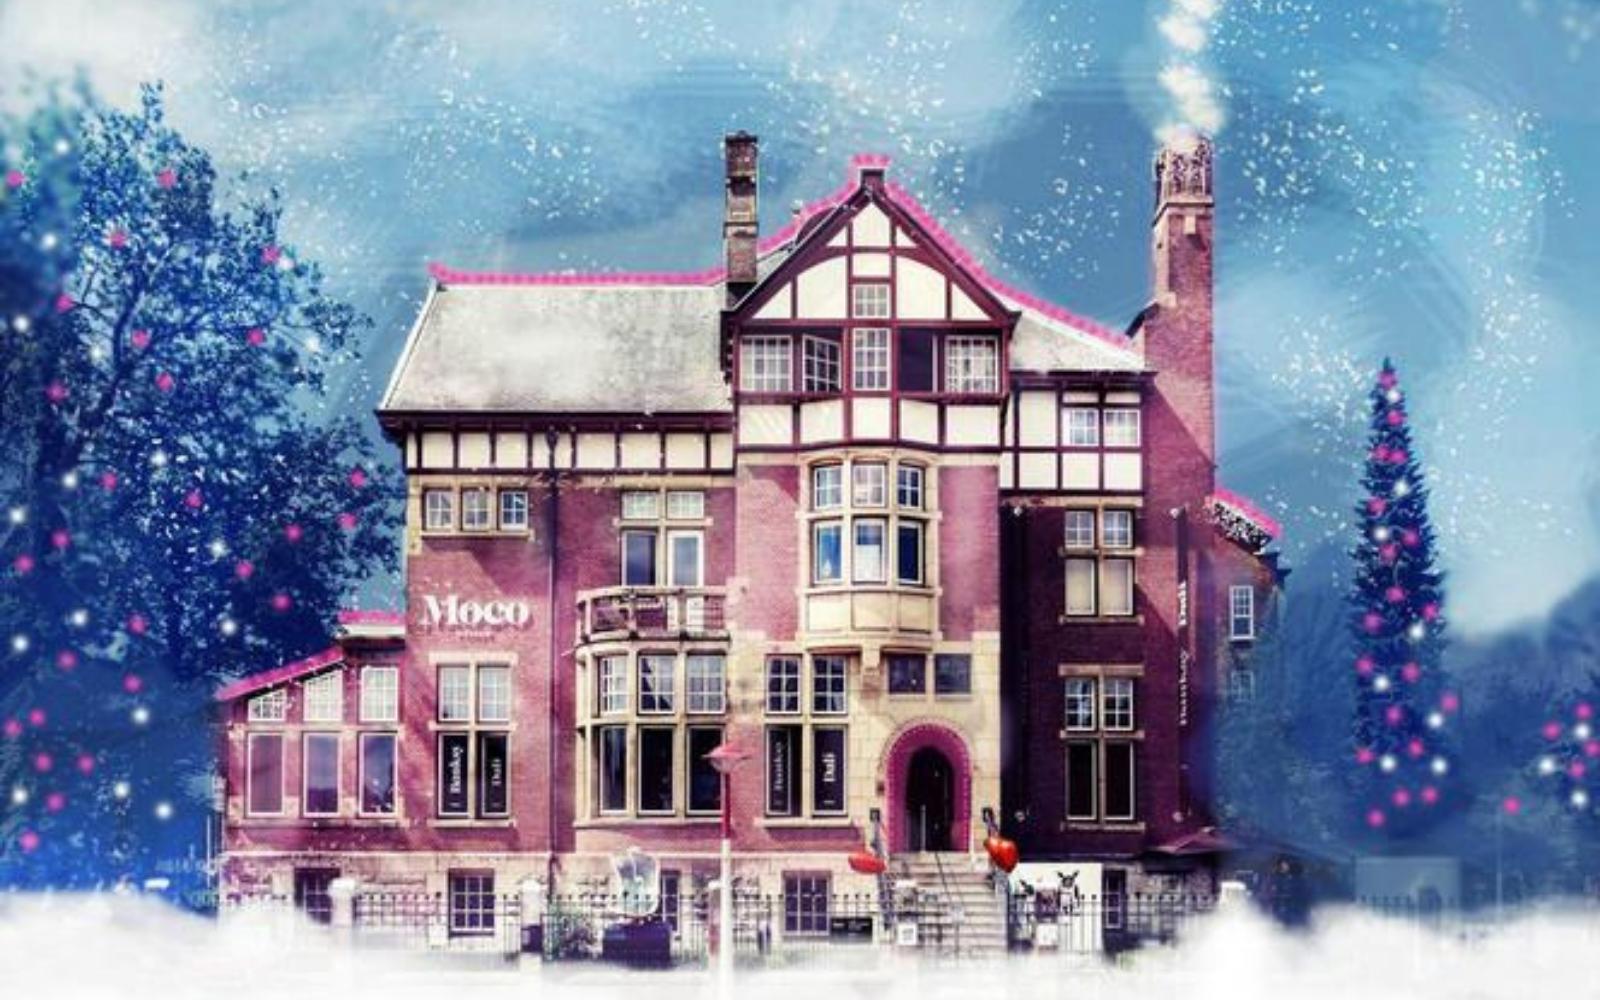 kerstmarkt amsterdam museumplein moco